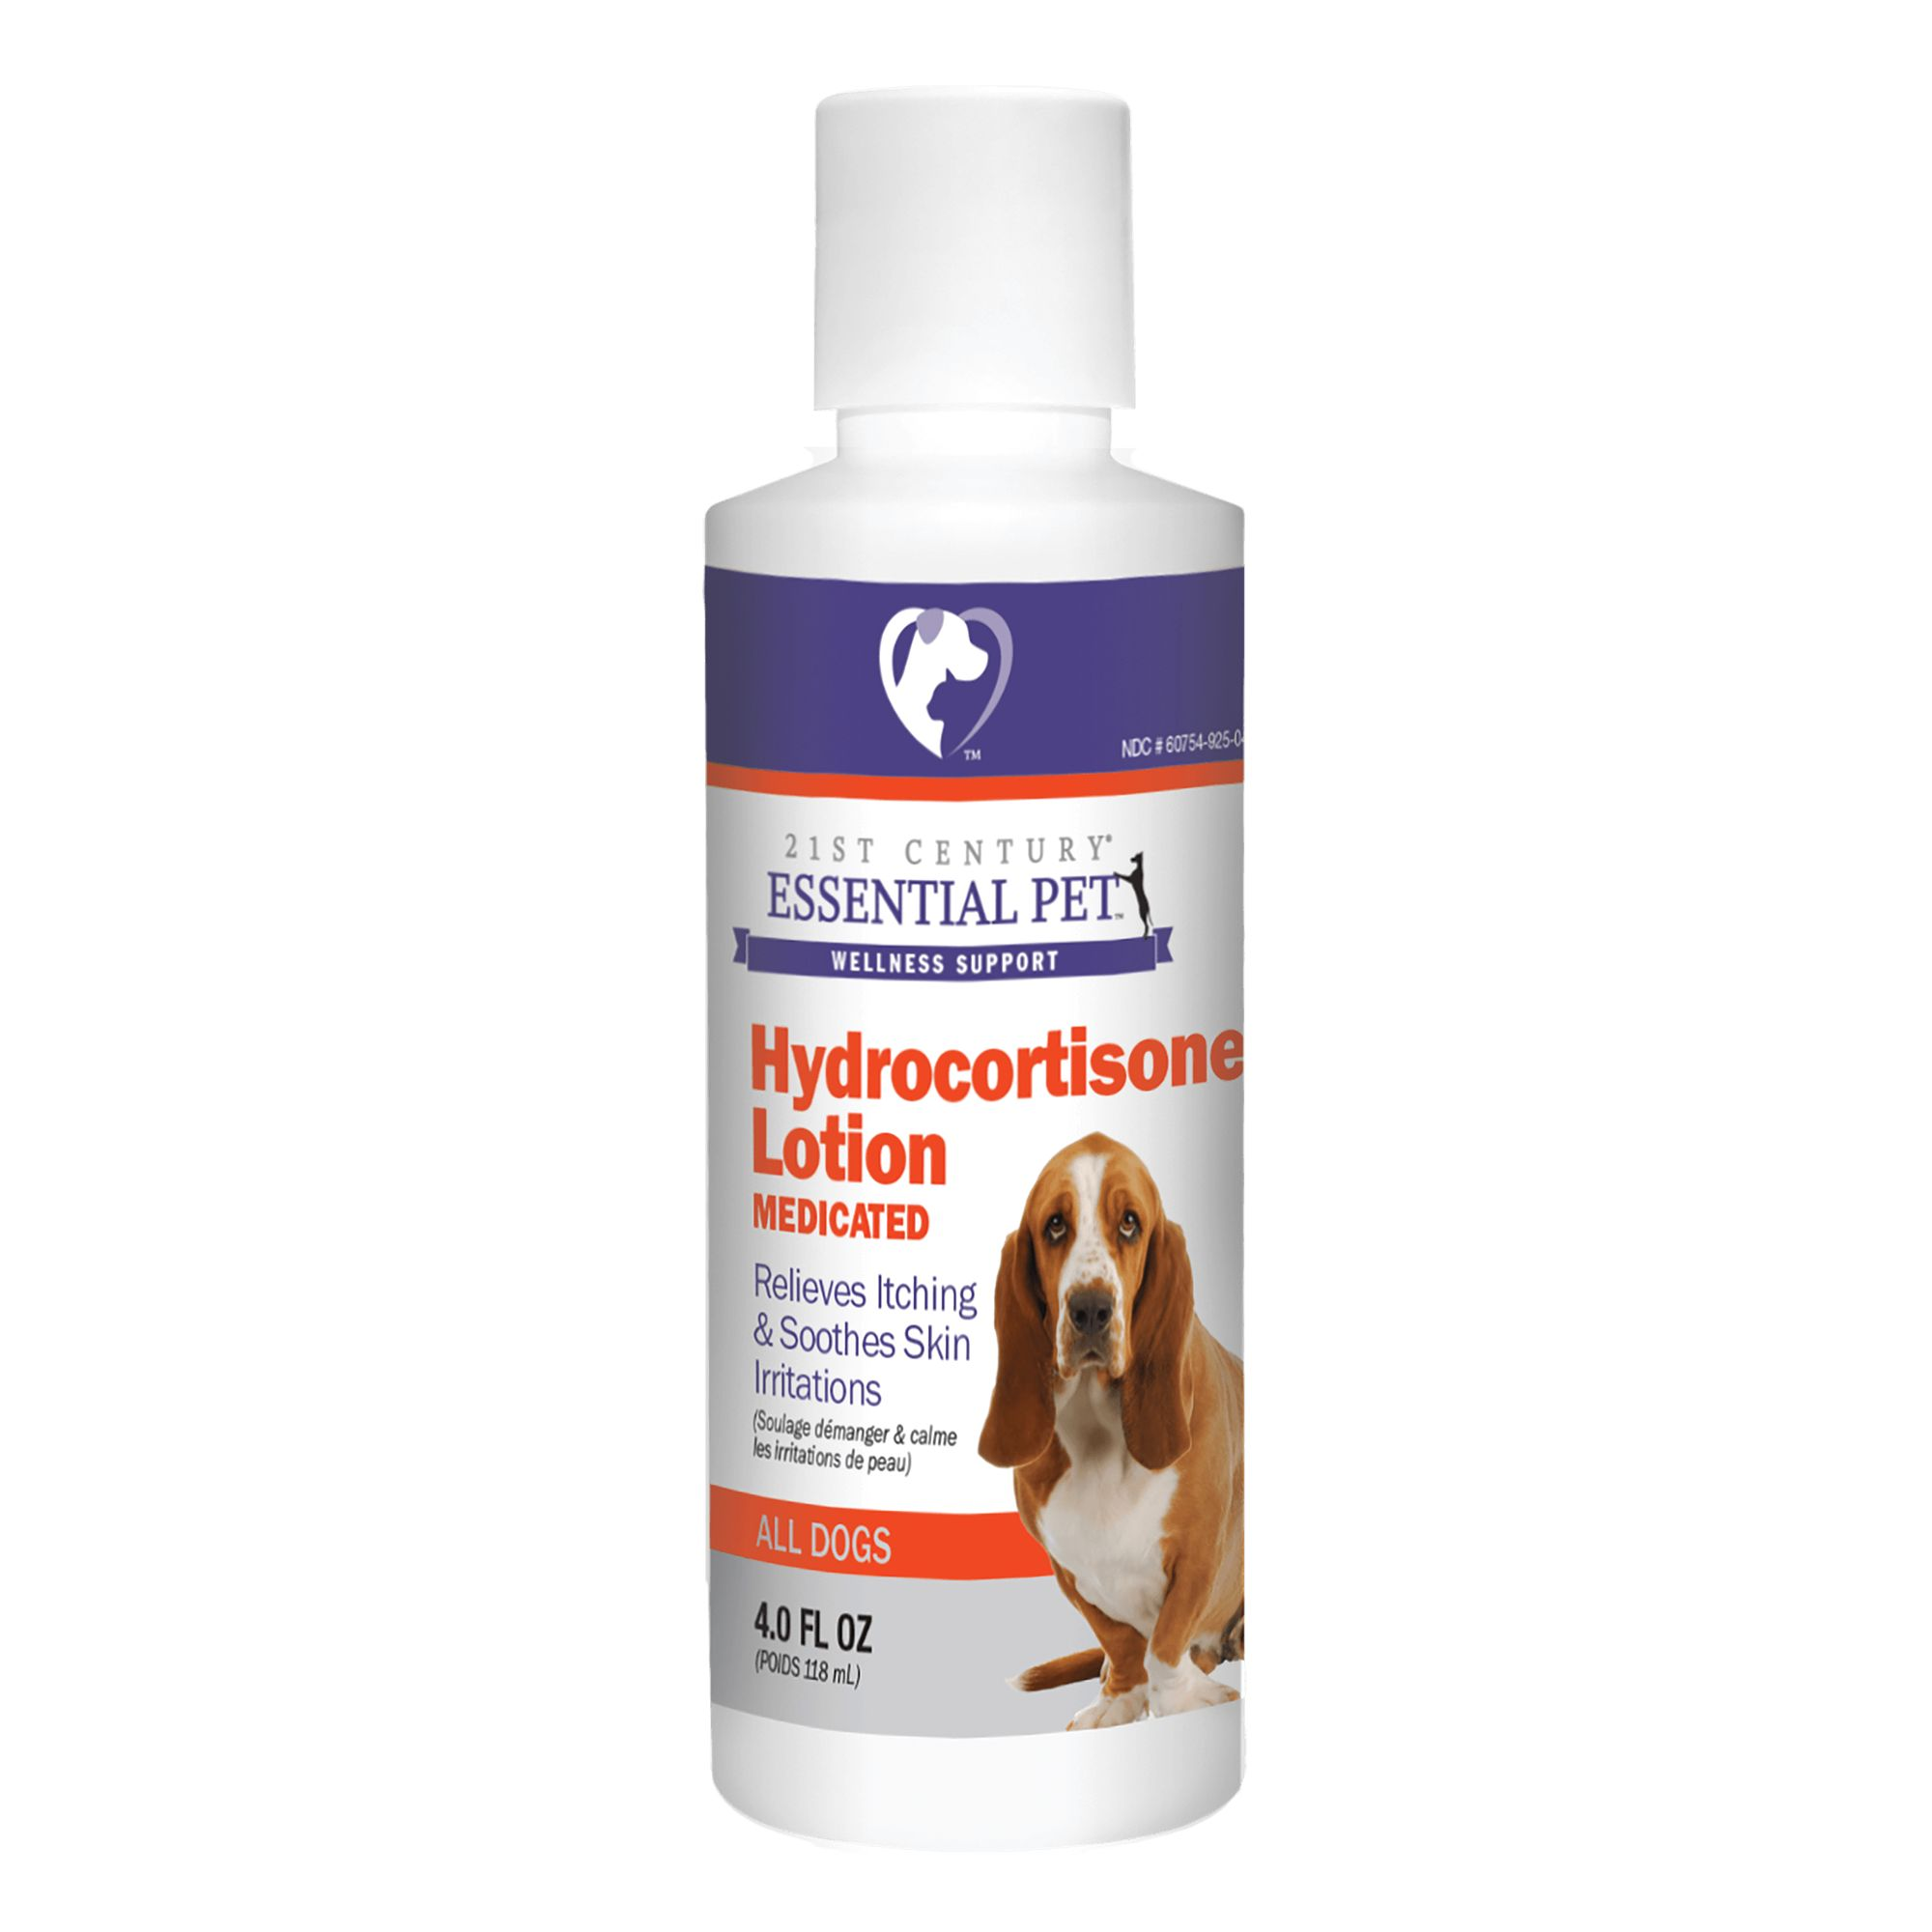 21st Century Hydrocortisone Dog Lotion Size 4 Oz